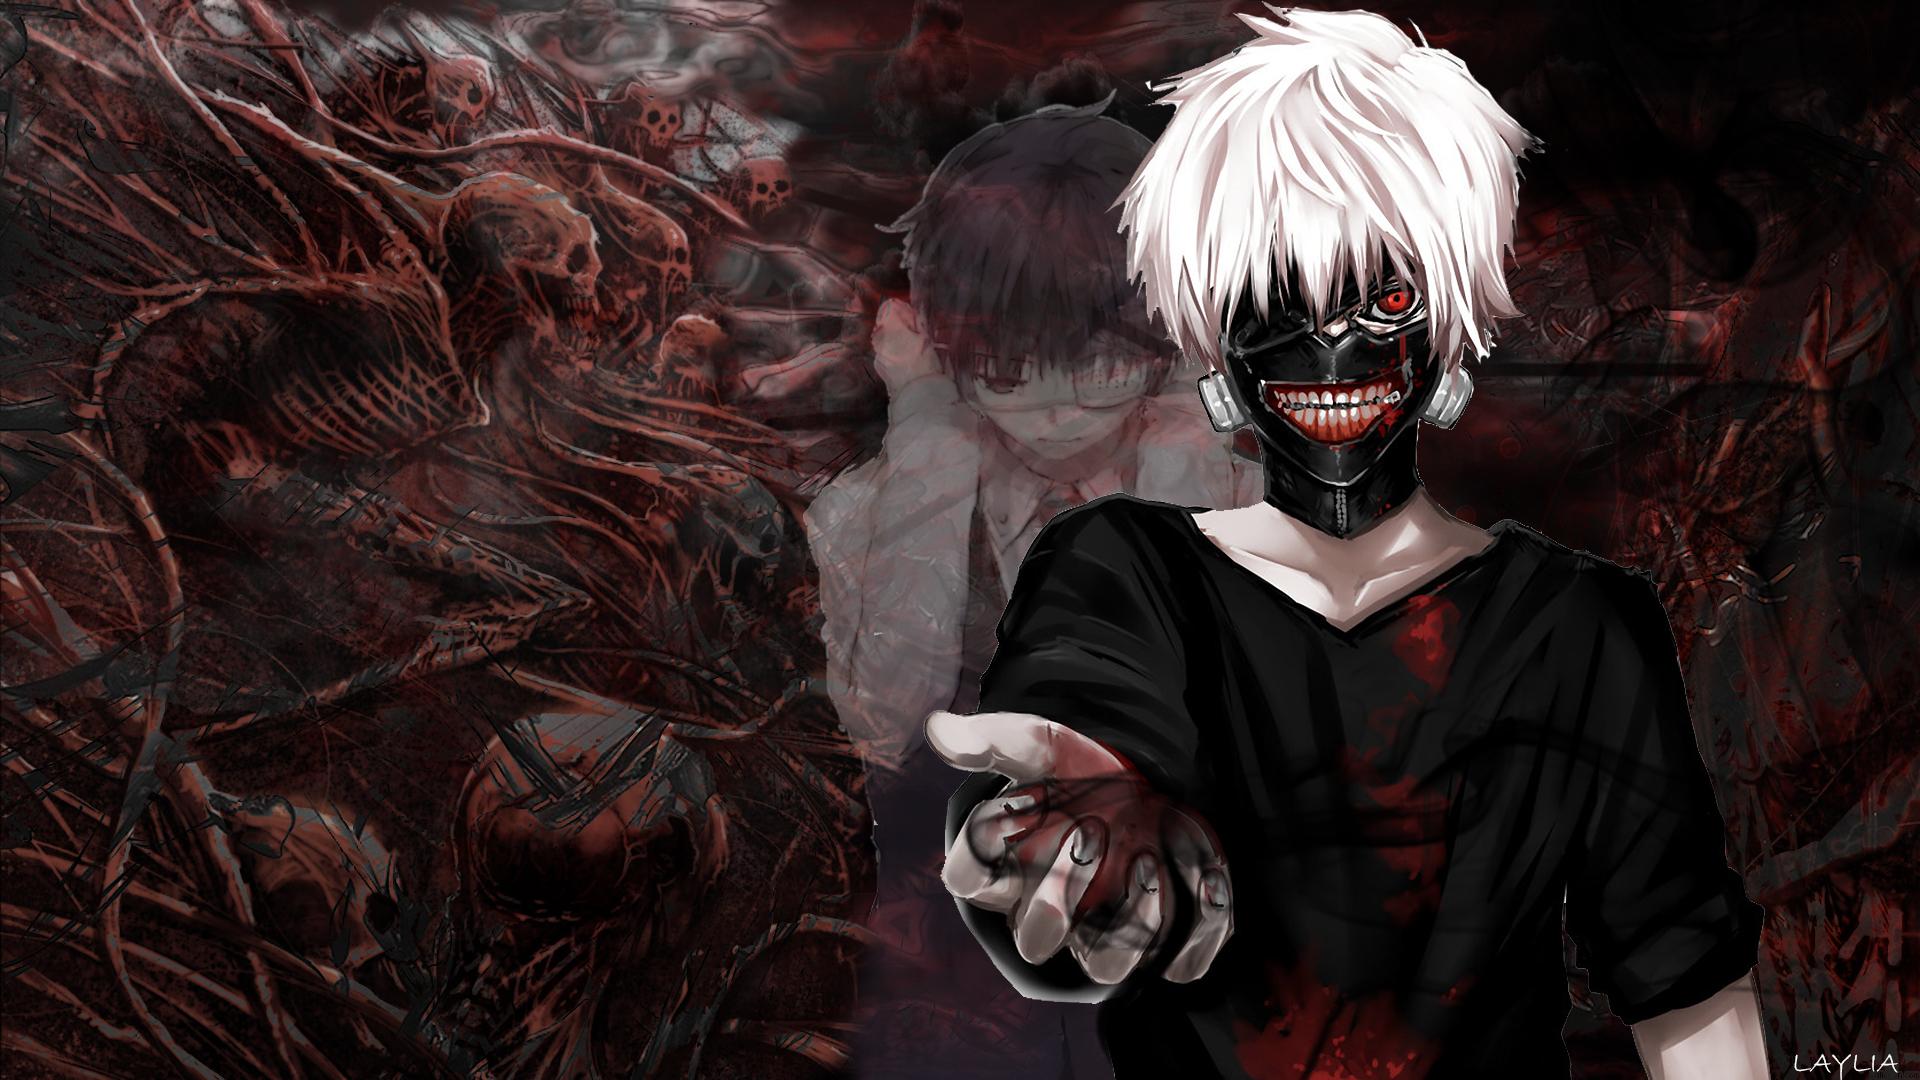 10 Wallpaper Hd Anime Tokyo Ghoul Anime Top Wallpaper